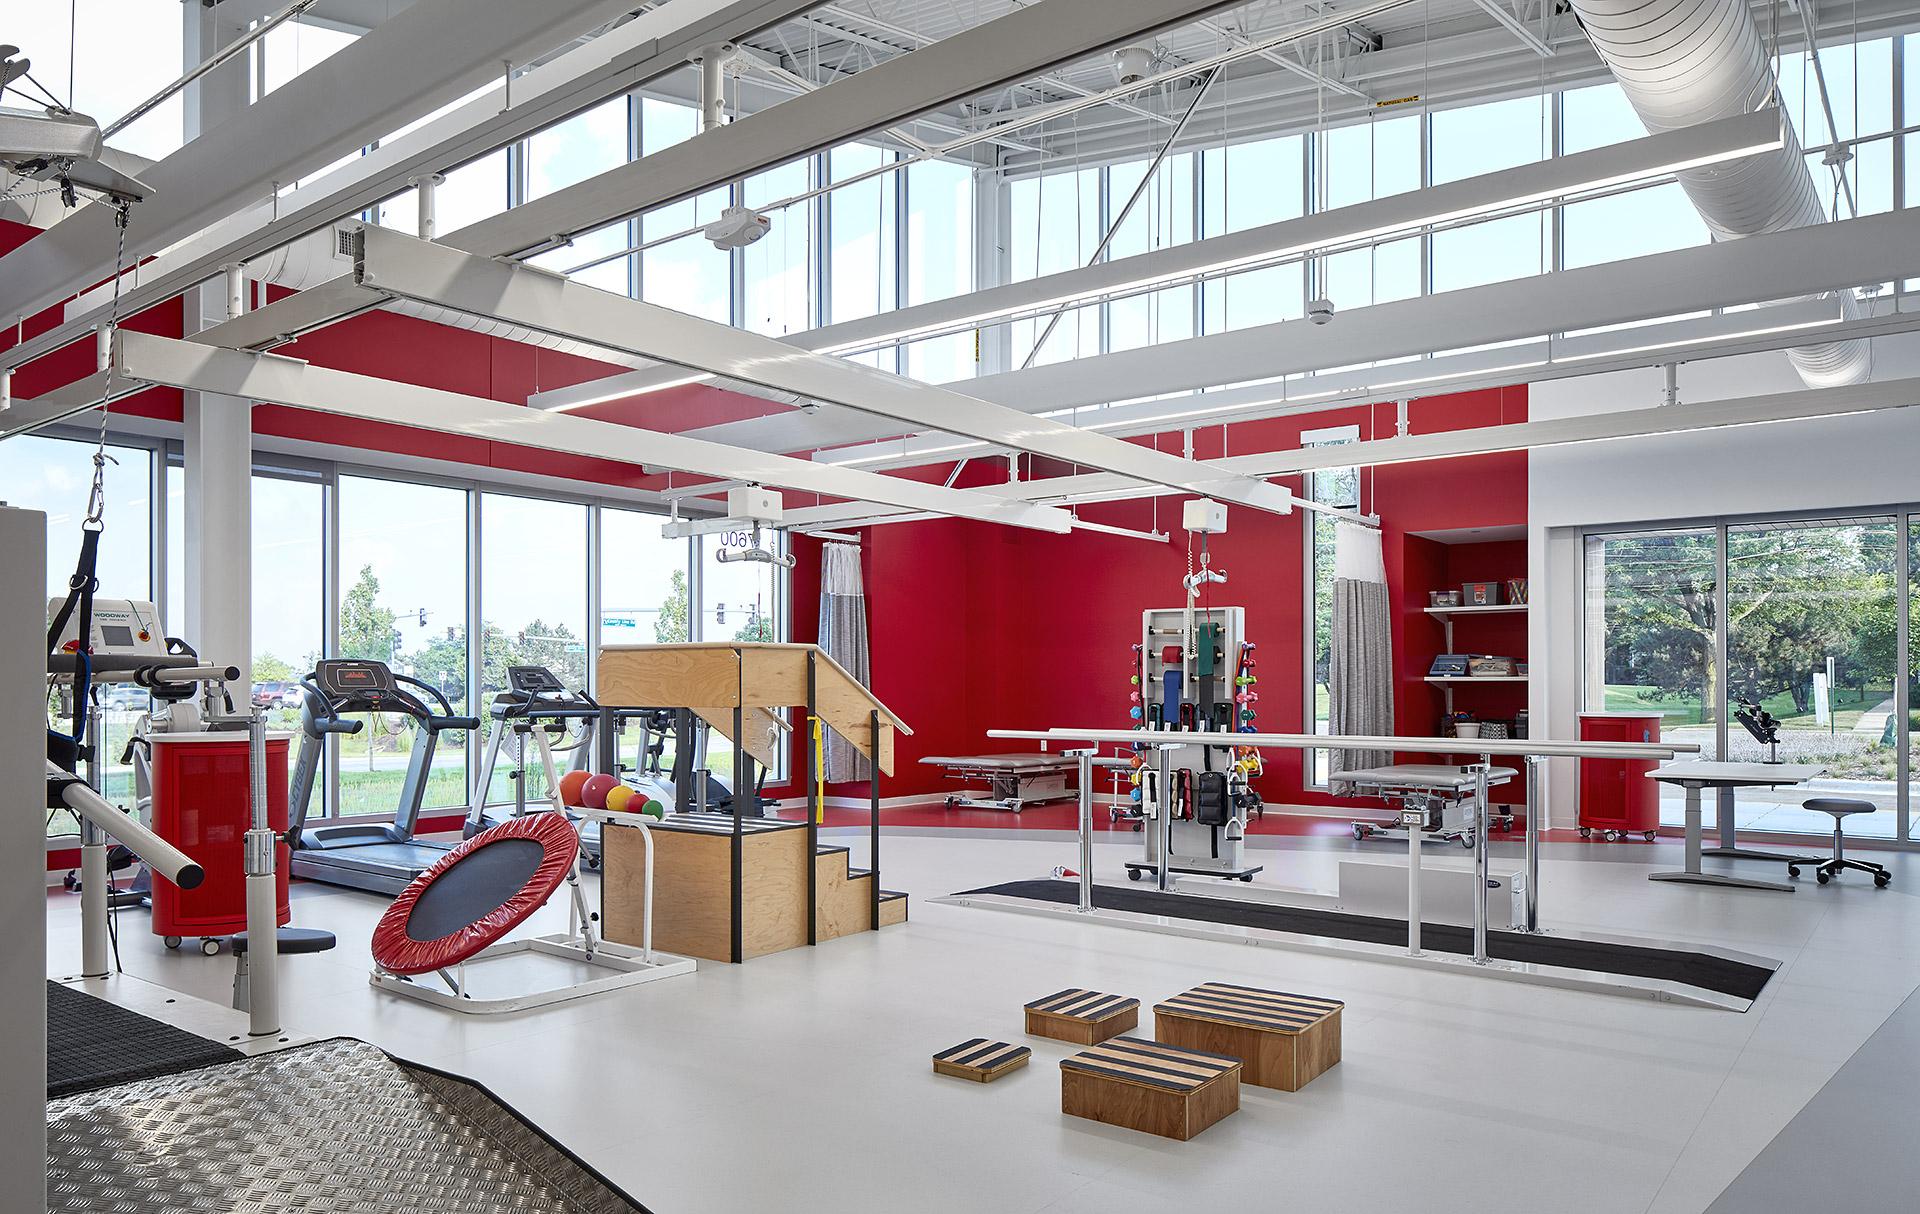 Gym Interior - Slide .jpg